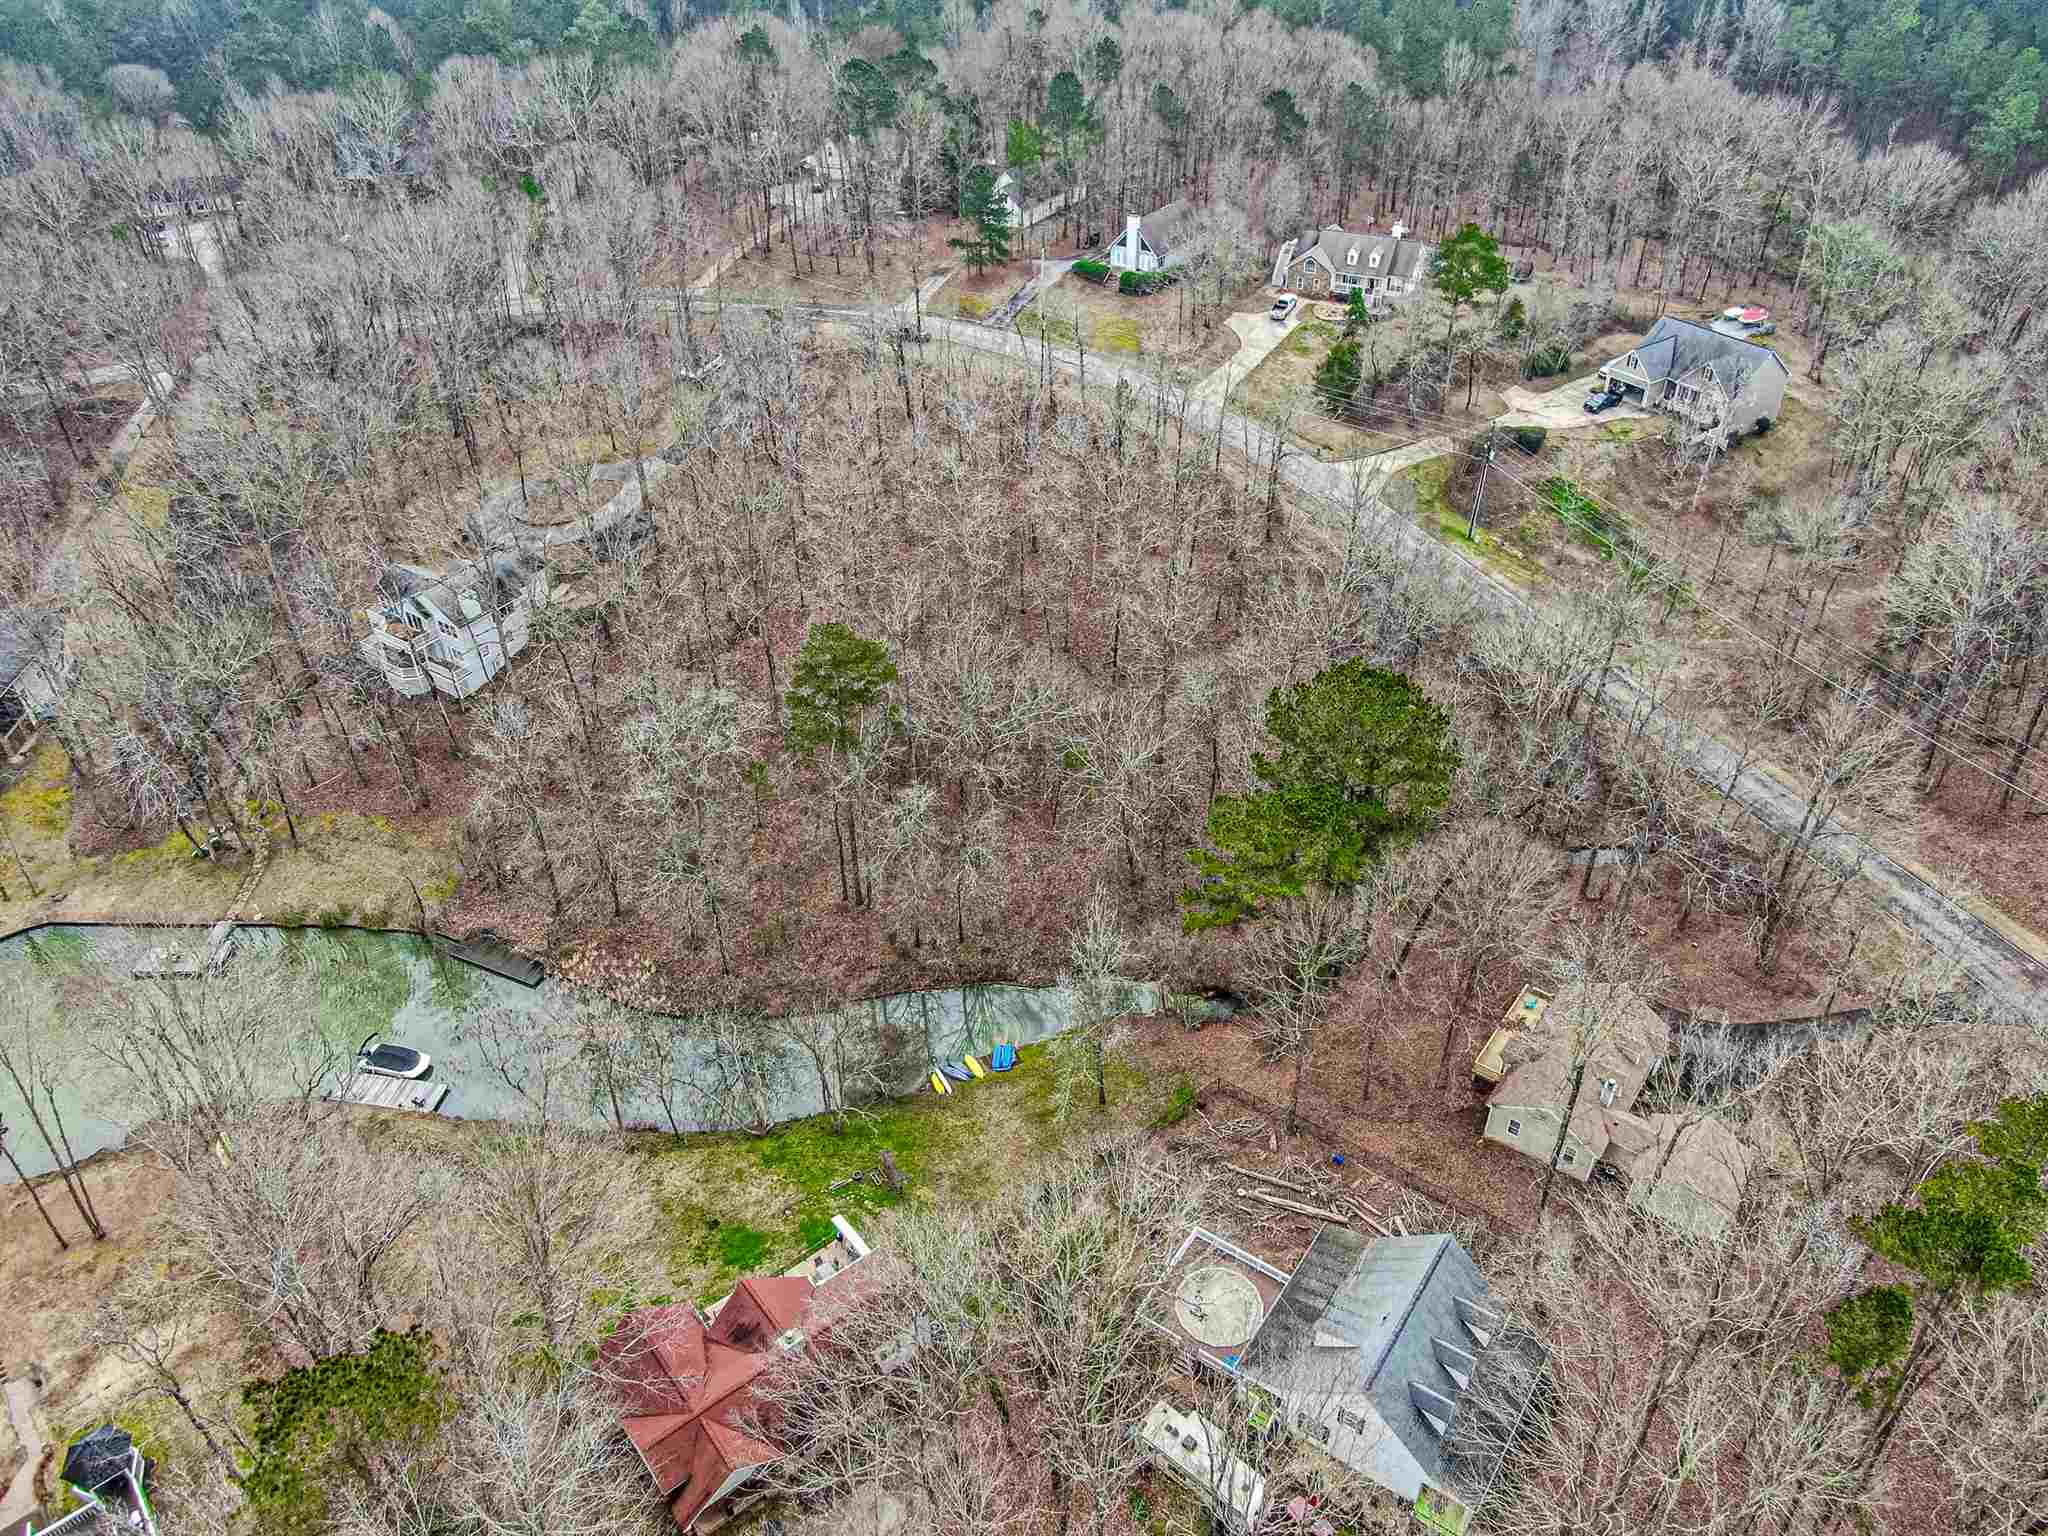 Property for sale at Lot 10 E RIVER BEND DRIVE, Eatonton,  Georgia 31024